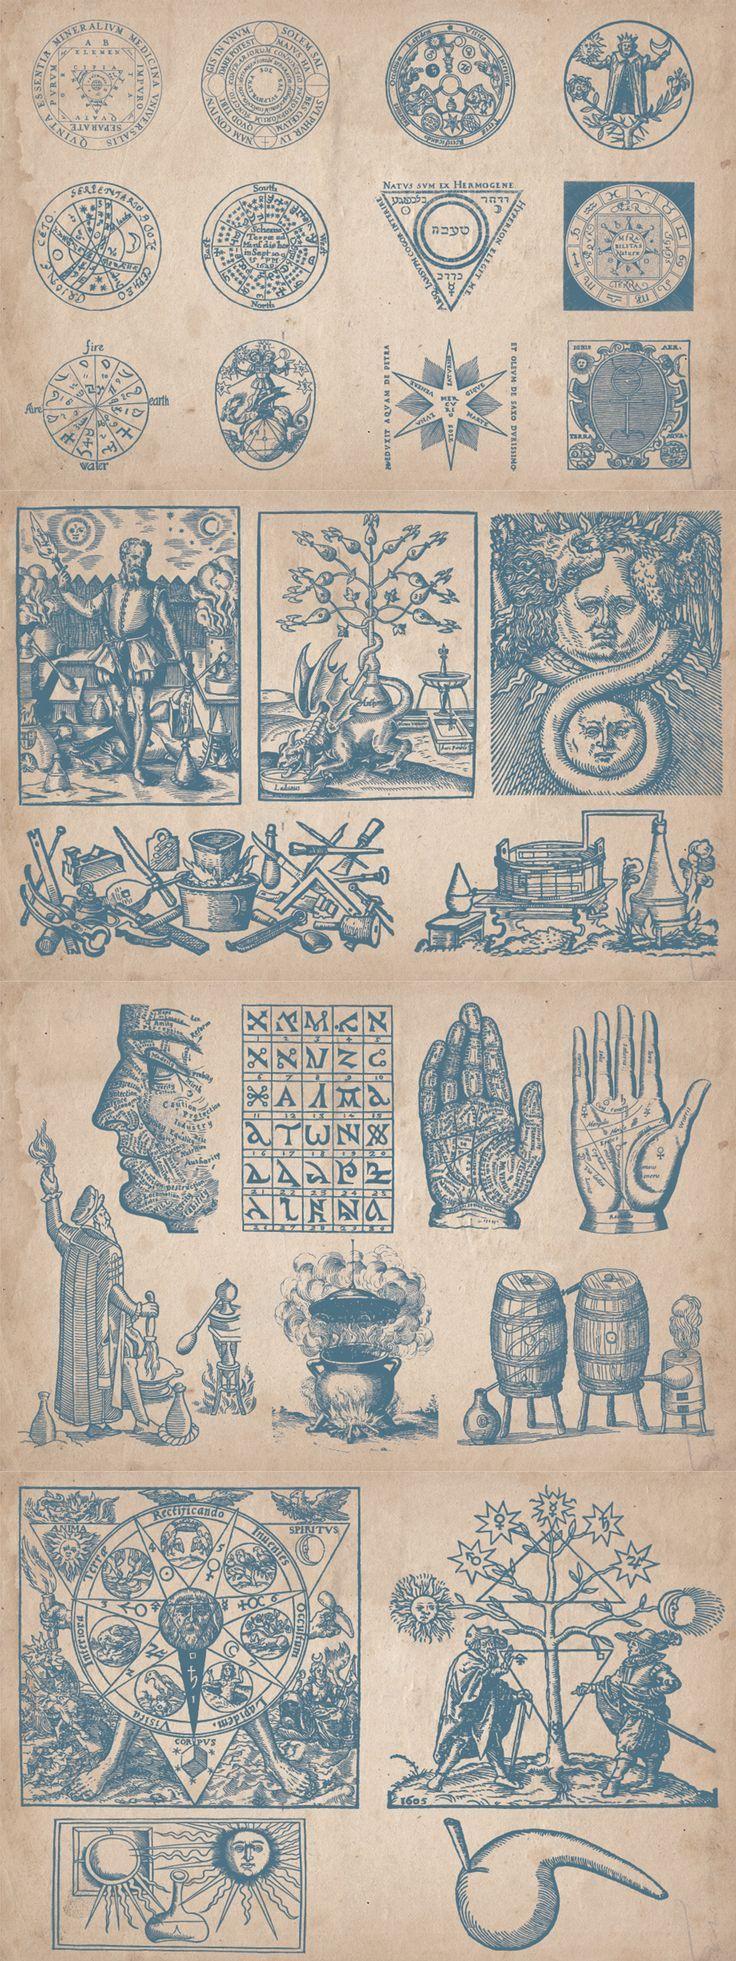 Vintage Alchemy Illustrations - https://www.designcuts.com/product/vintage-alchemy-illustrations/